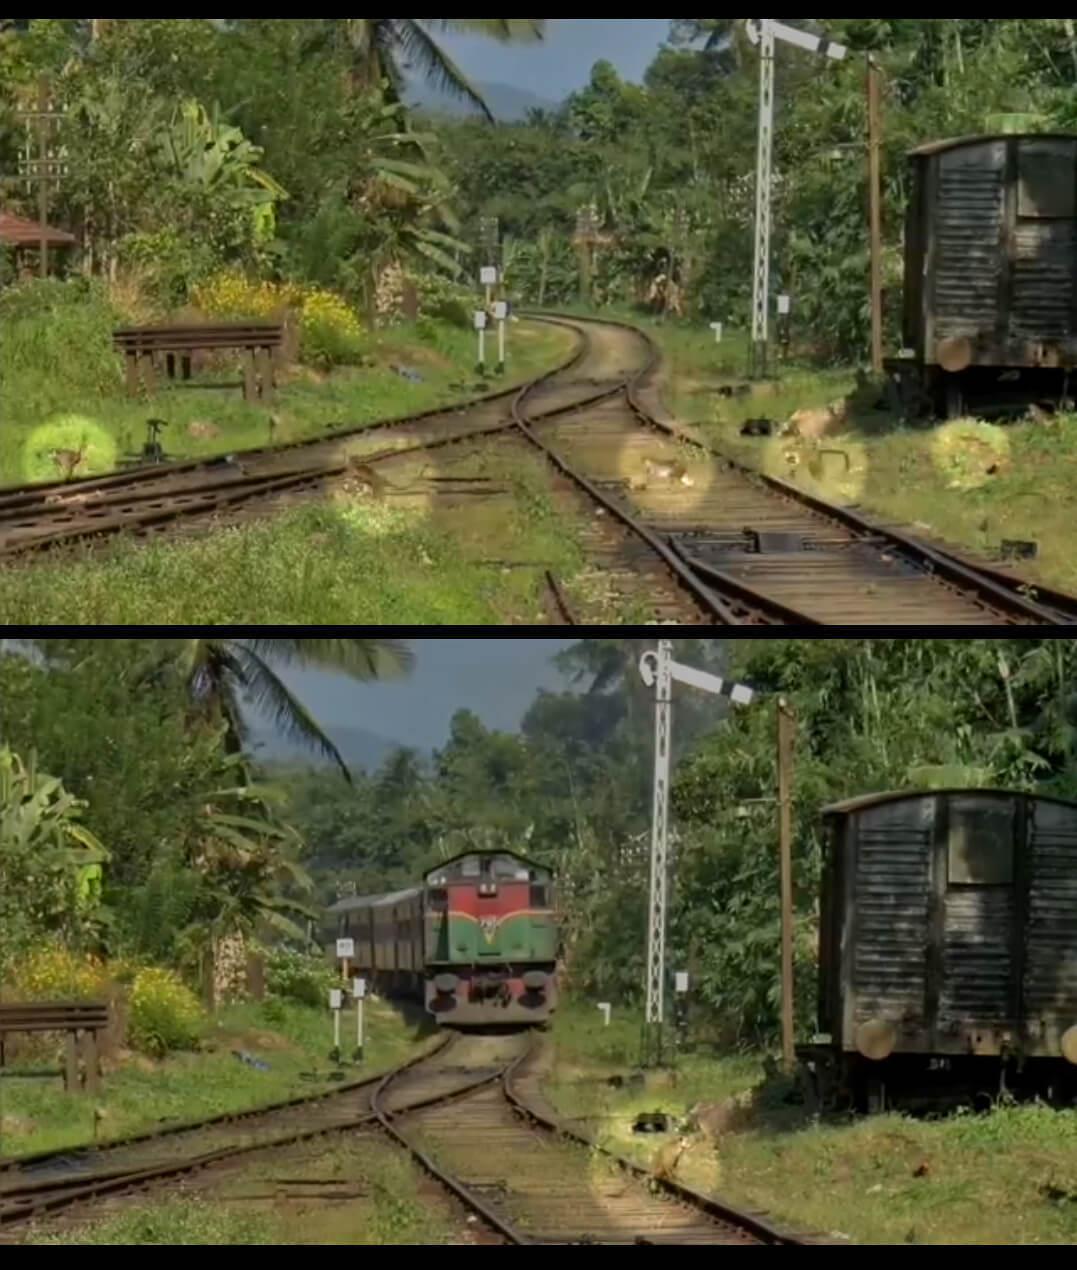 MonkeysTrespassing-KadugannawaRailwayStation-SriLanka.jpg